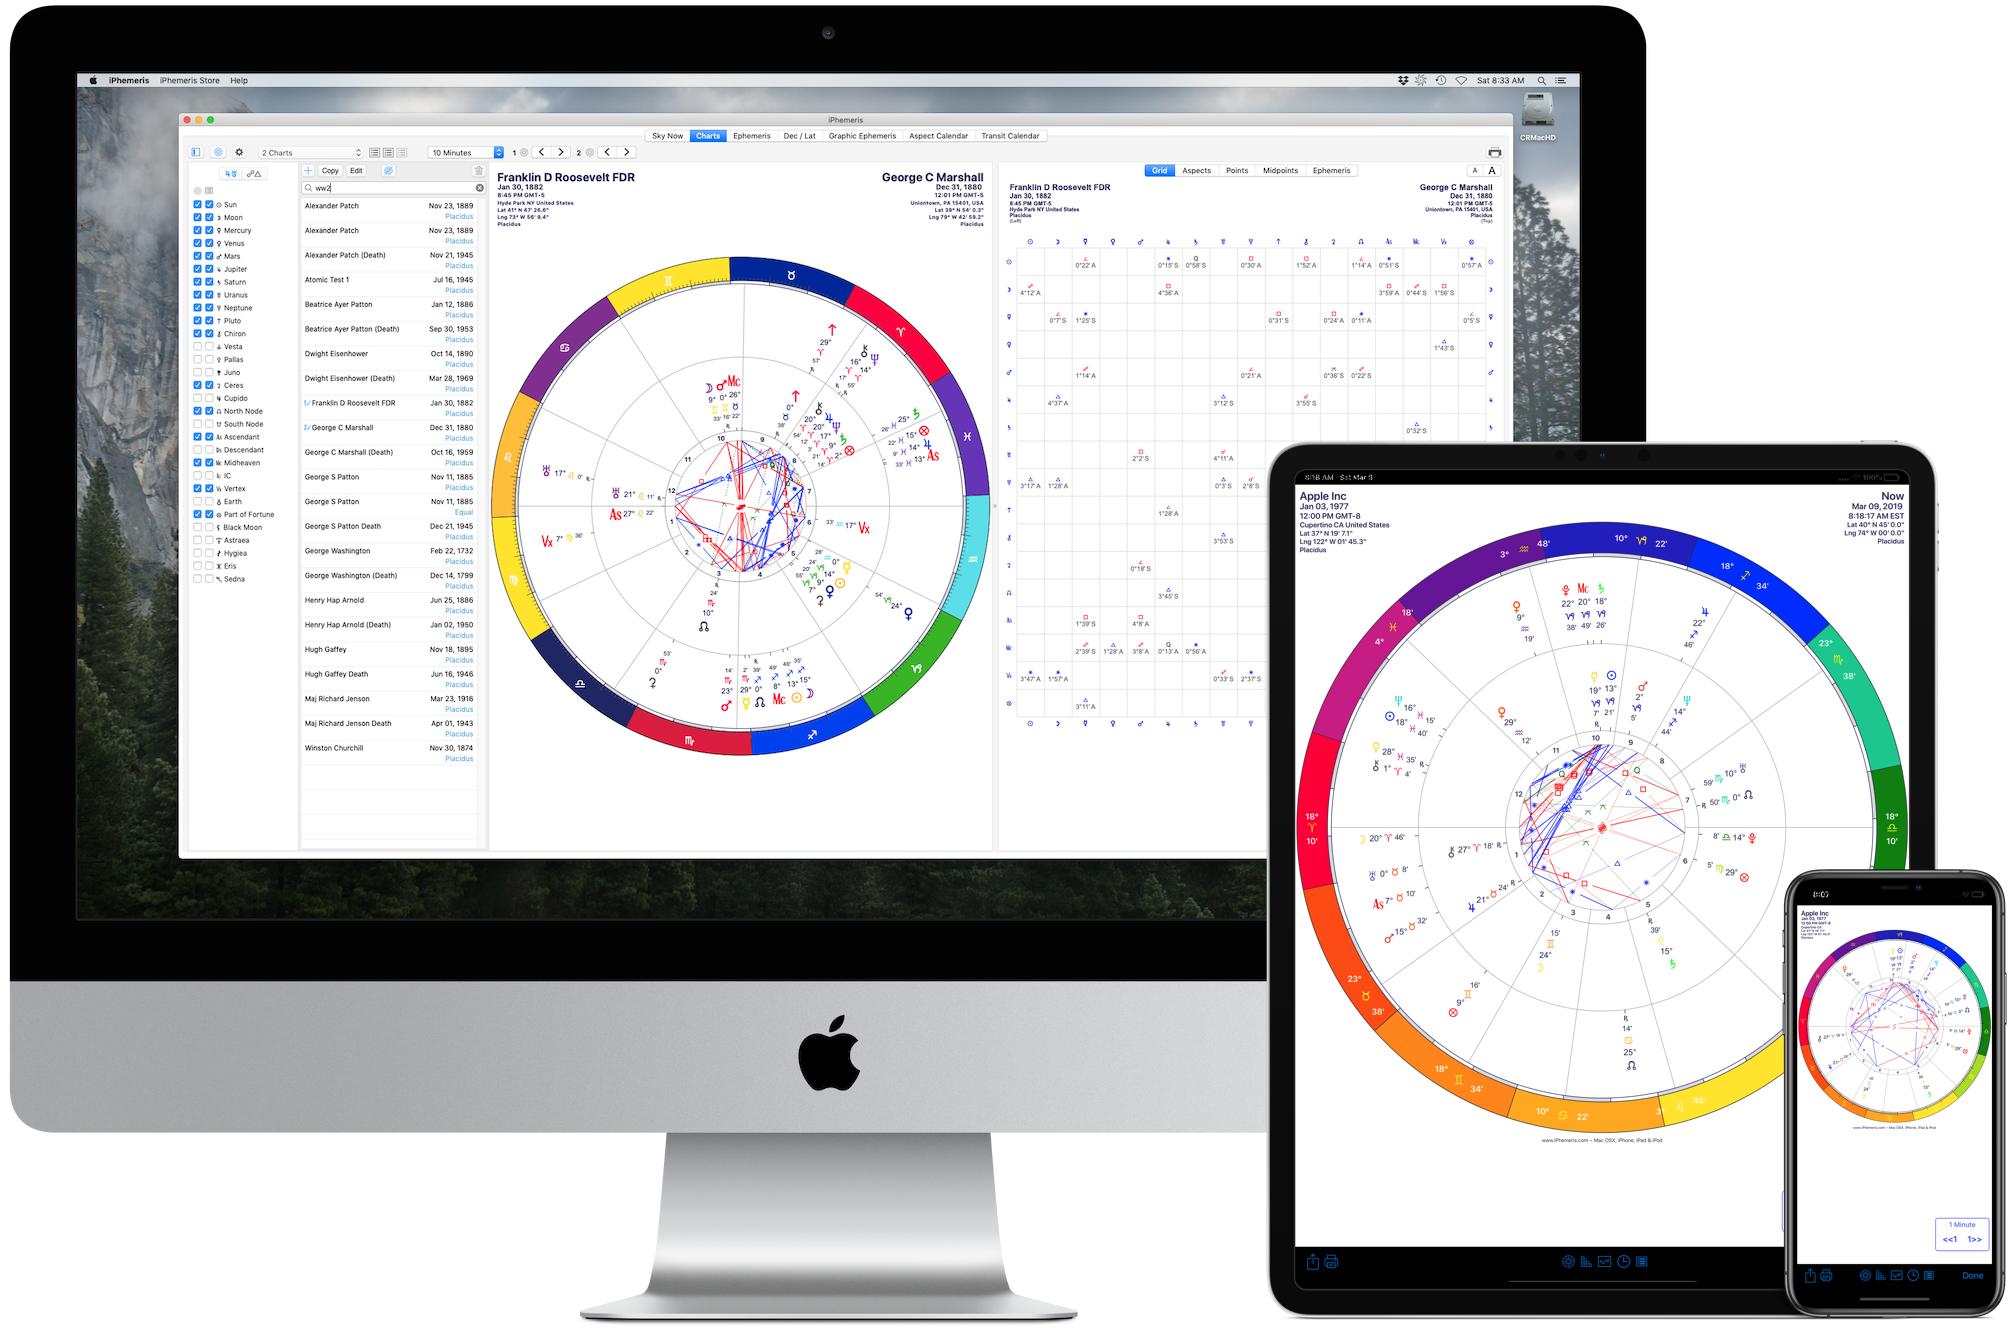 Astrology Software for Mac, iPhone & iPad | iPhemeris